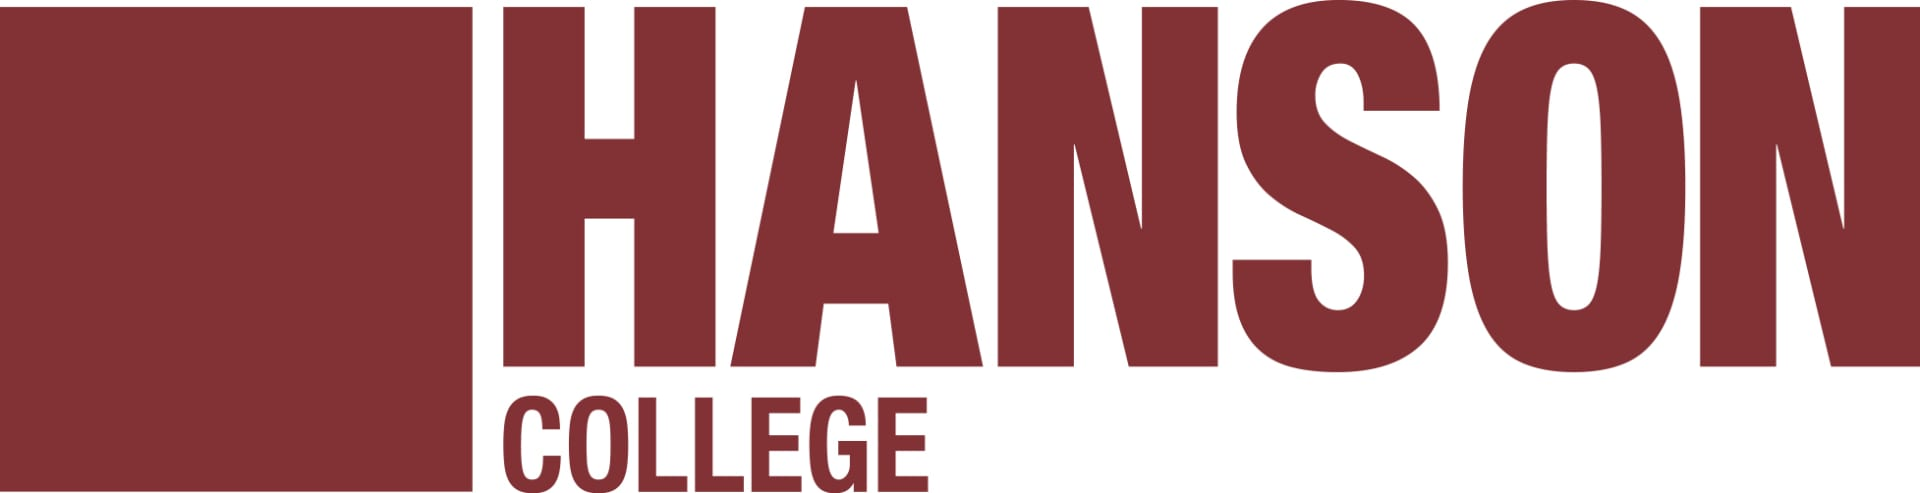 Hanson College Logo